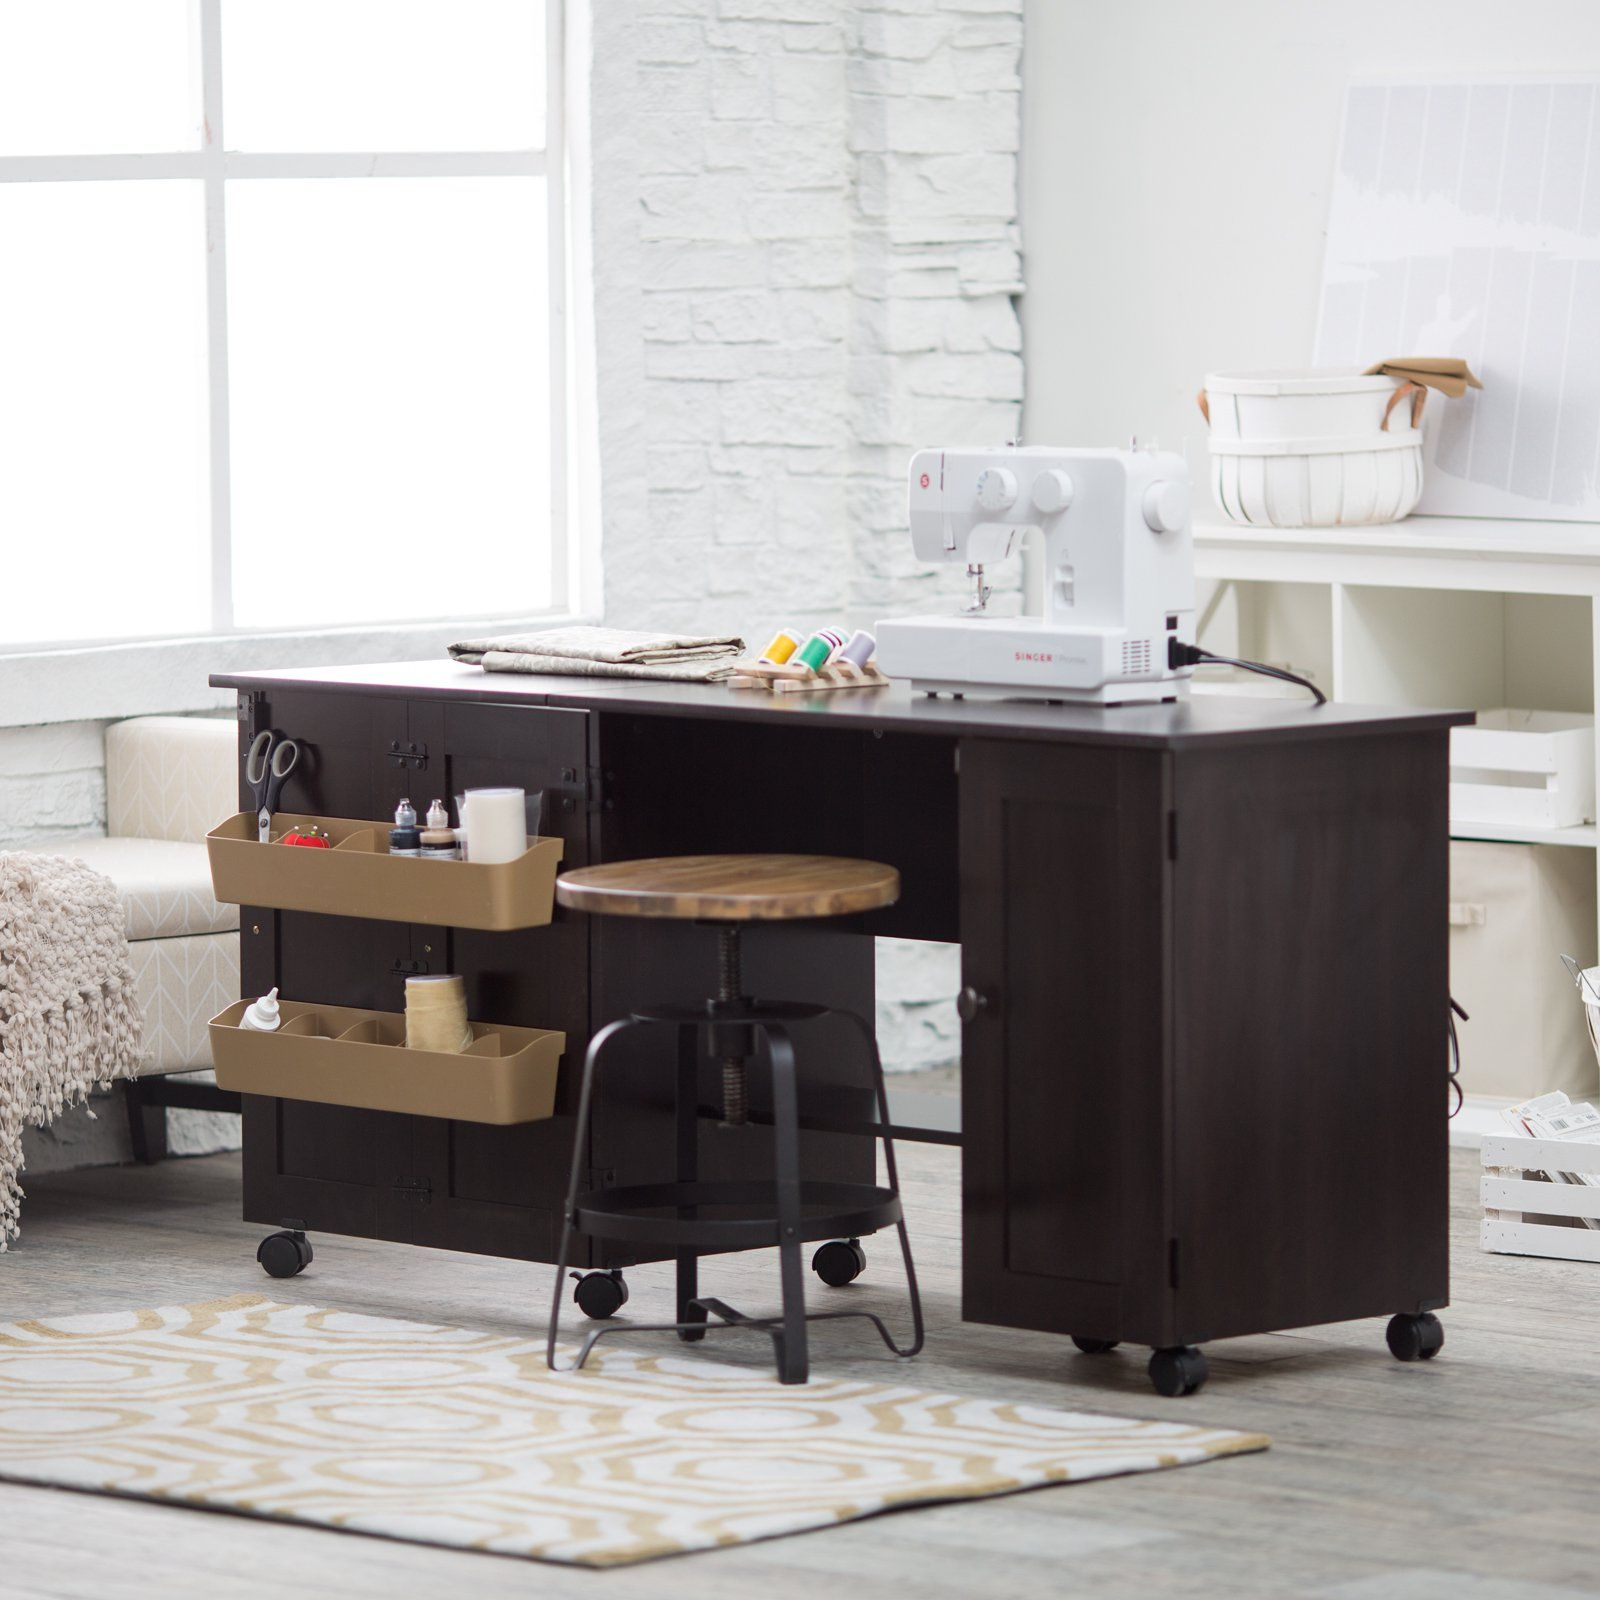 Sauder Sewing Craft Table   Cinnamon Cherry   Sewing Furniture At Hayneedle